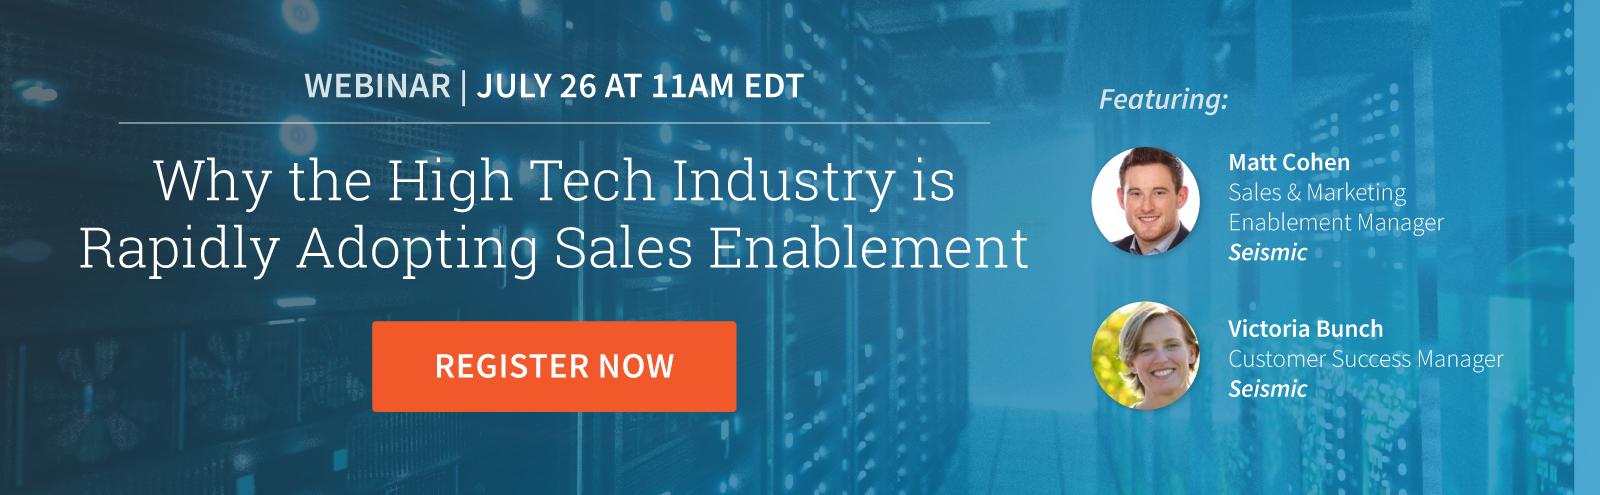 high tech sales enablement